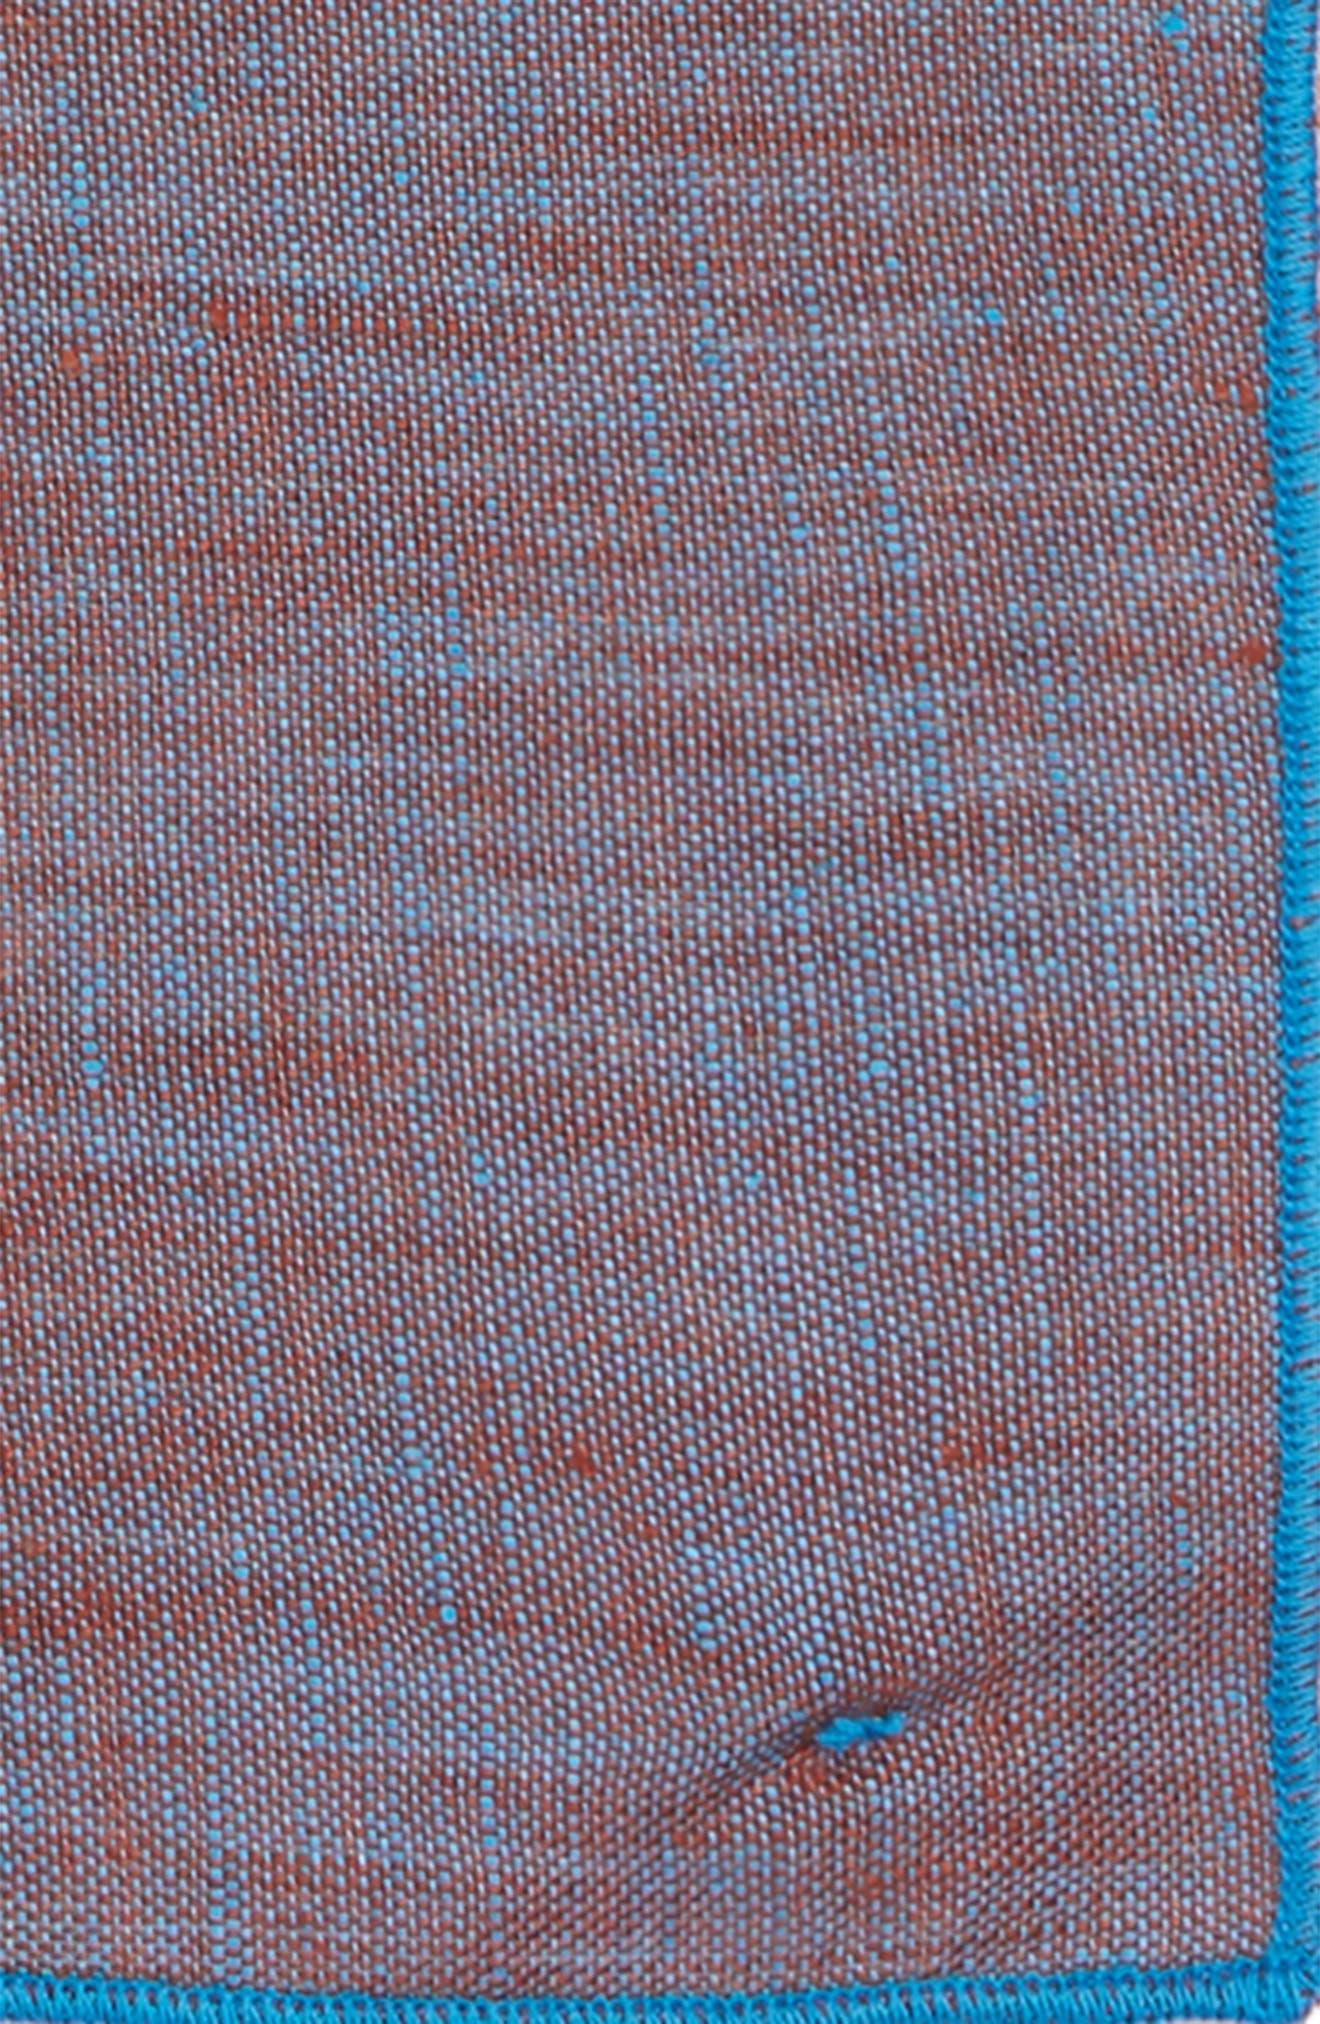 Iridescent Glass Linen Pocket Square,                             Alternate thumbnail 3, color,                             Teal